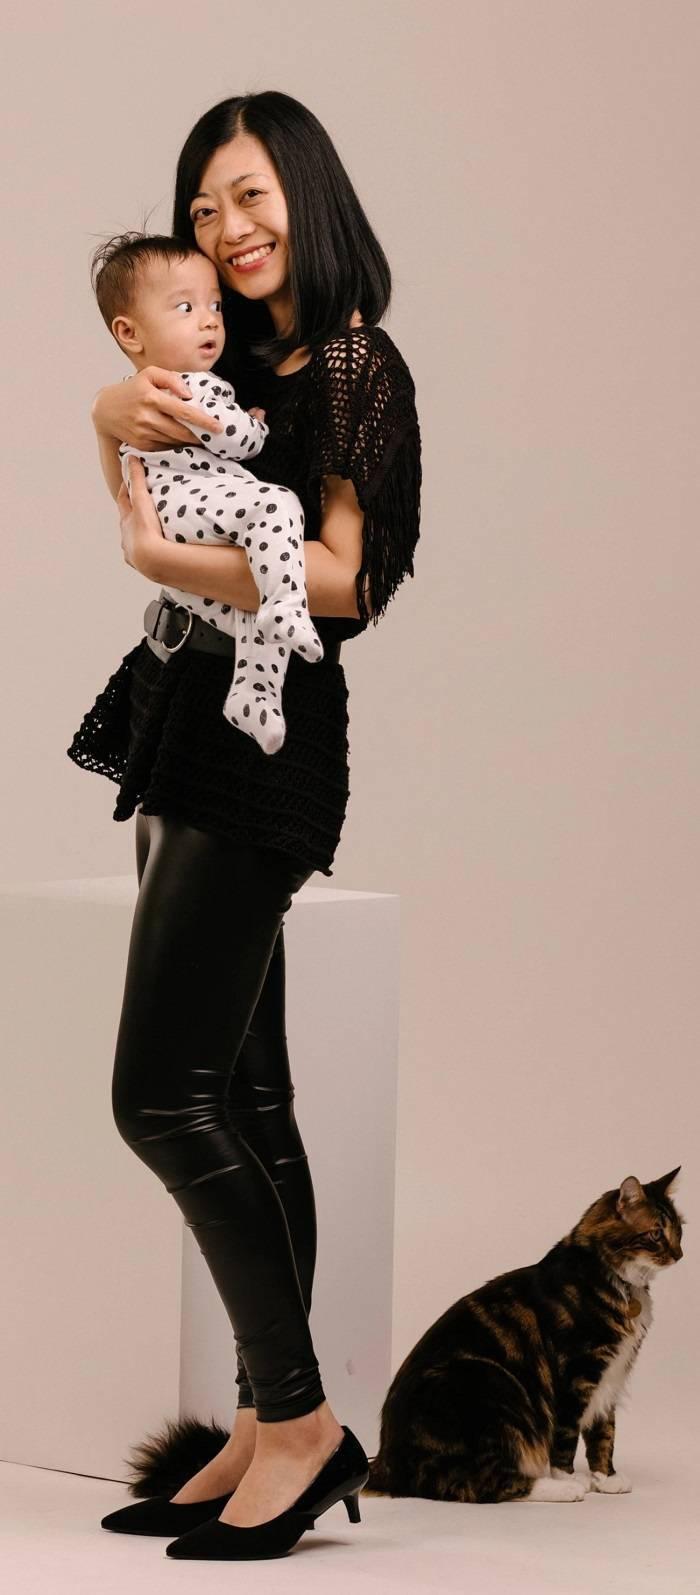 vegan fashion designer cute vegan baby